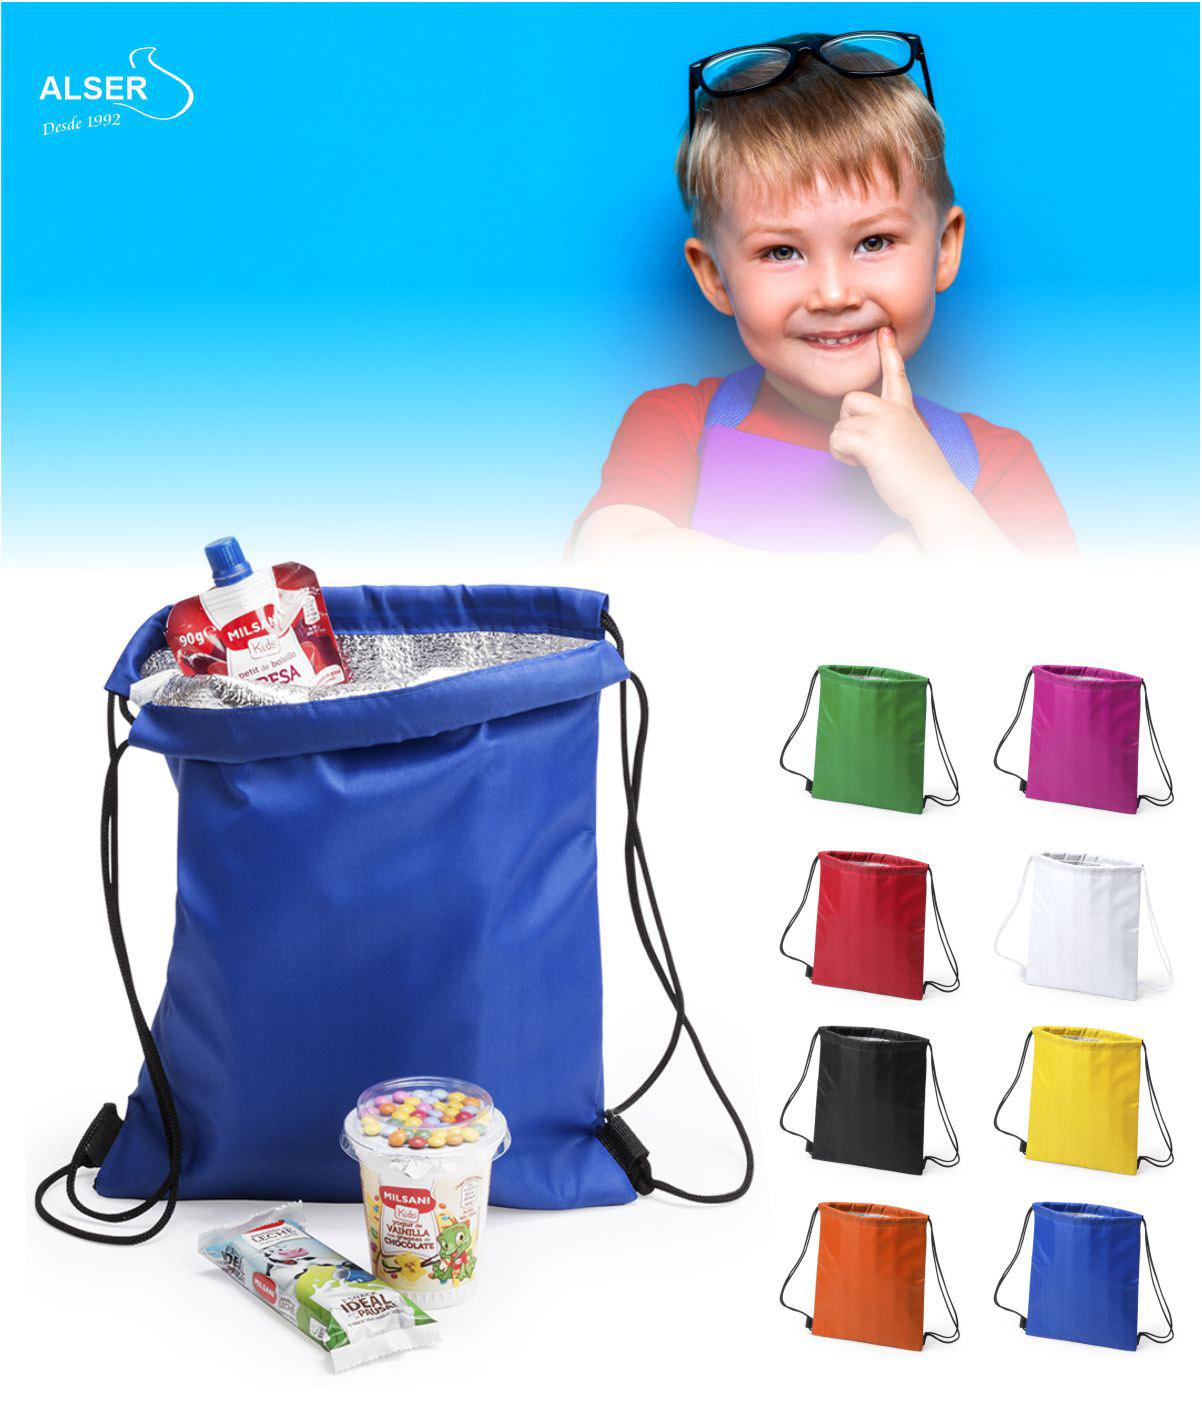 Mochila de cuerdas nevera infantil. Gama de colores.